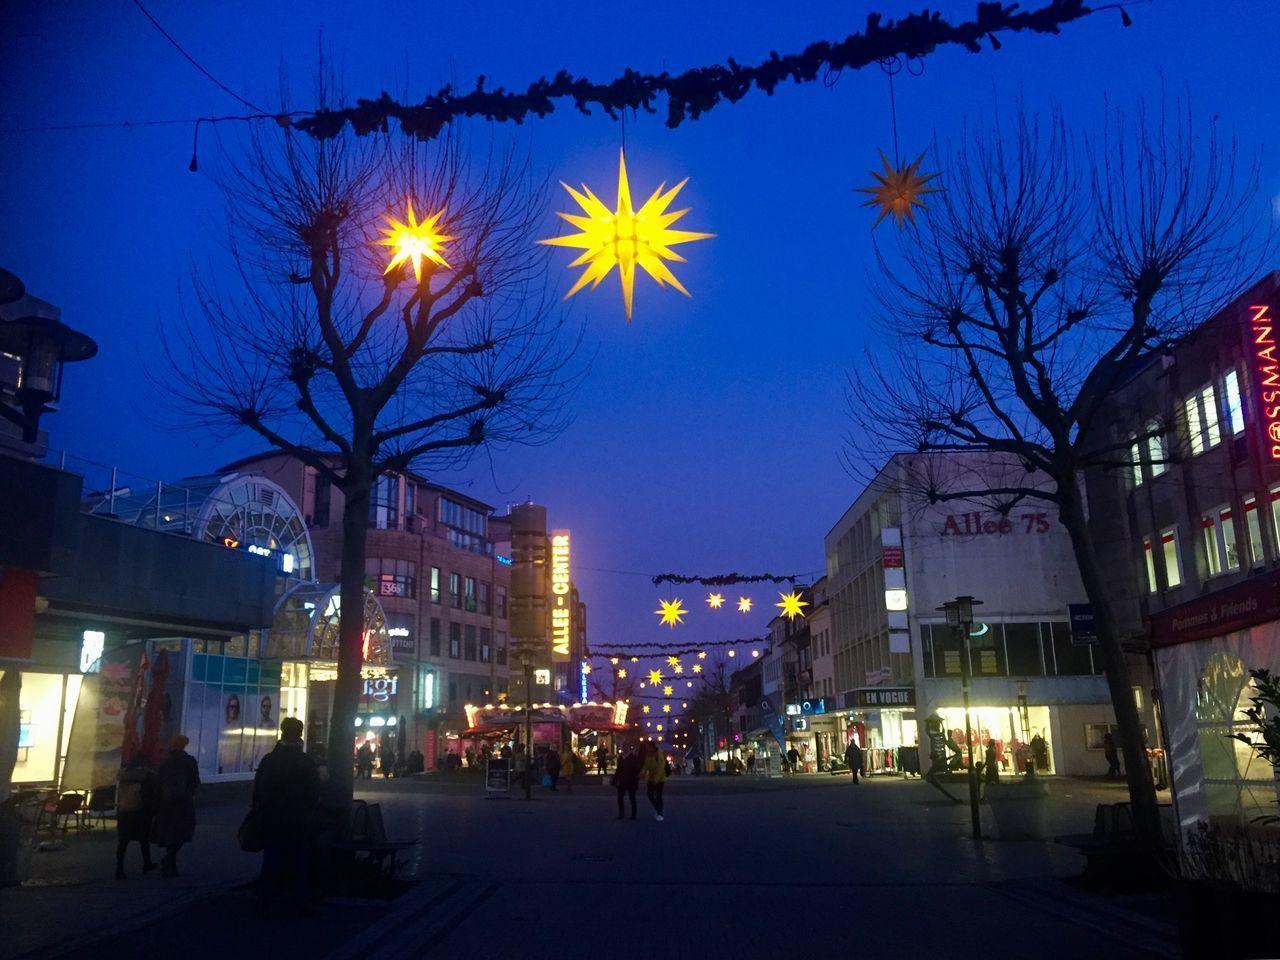 ILLUMINATED STREET LIGHTS AND BUILDINGS AT NIGHT